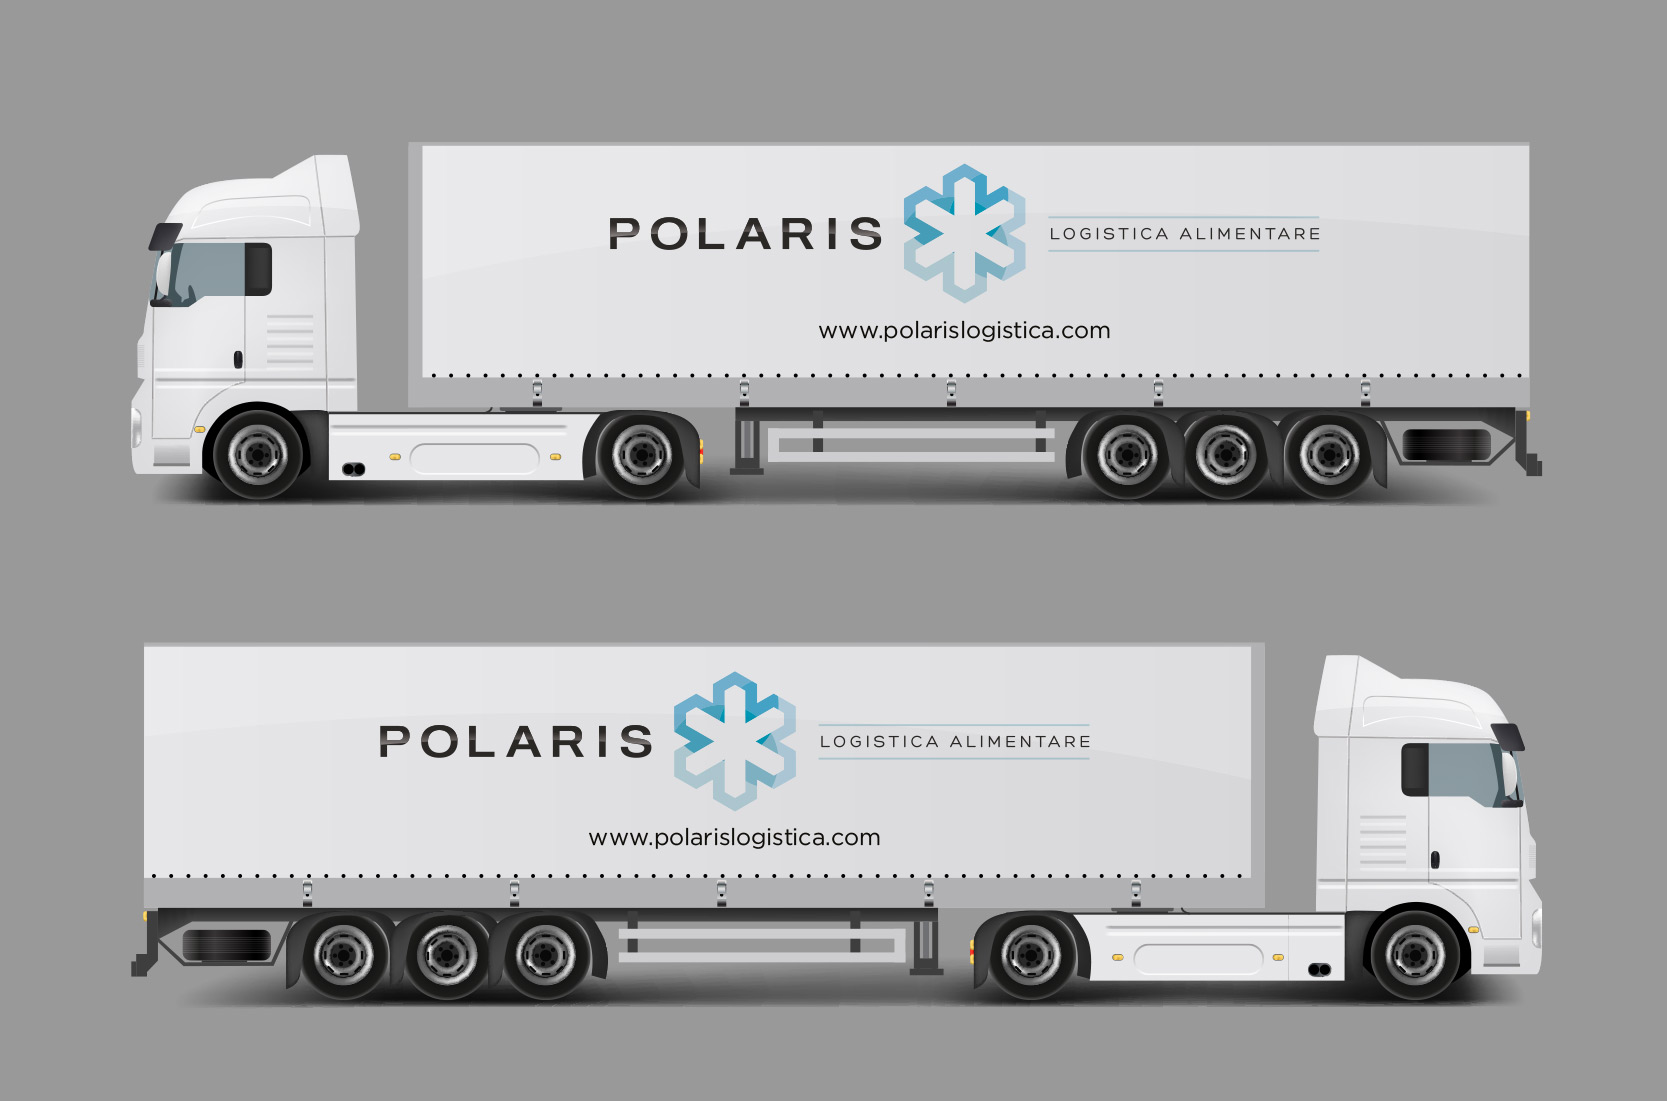 {focus_keyword} Allestimento grafico per bilico autoarticolato POLARIS POLARIS MOCKUP 01